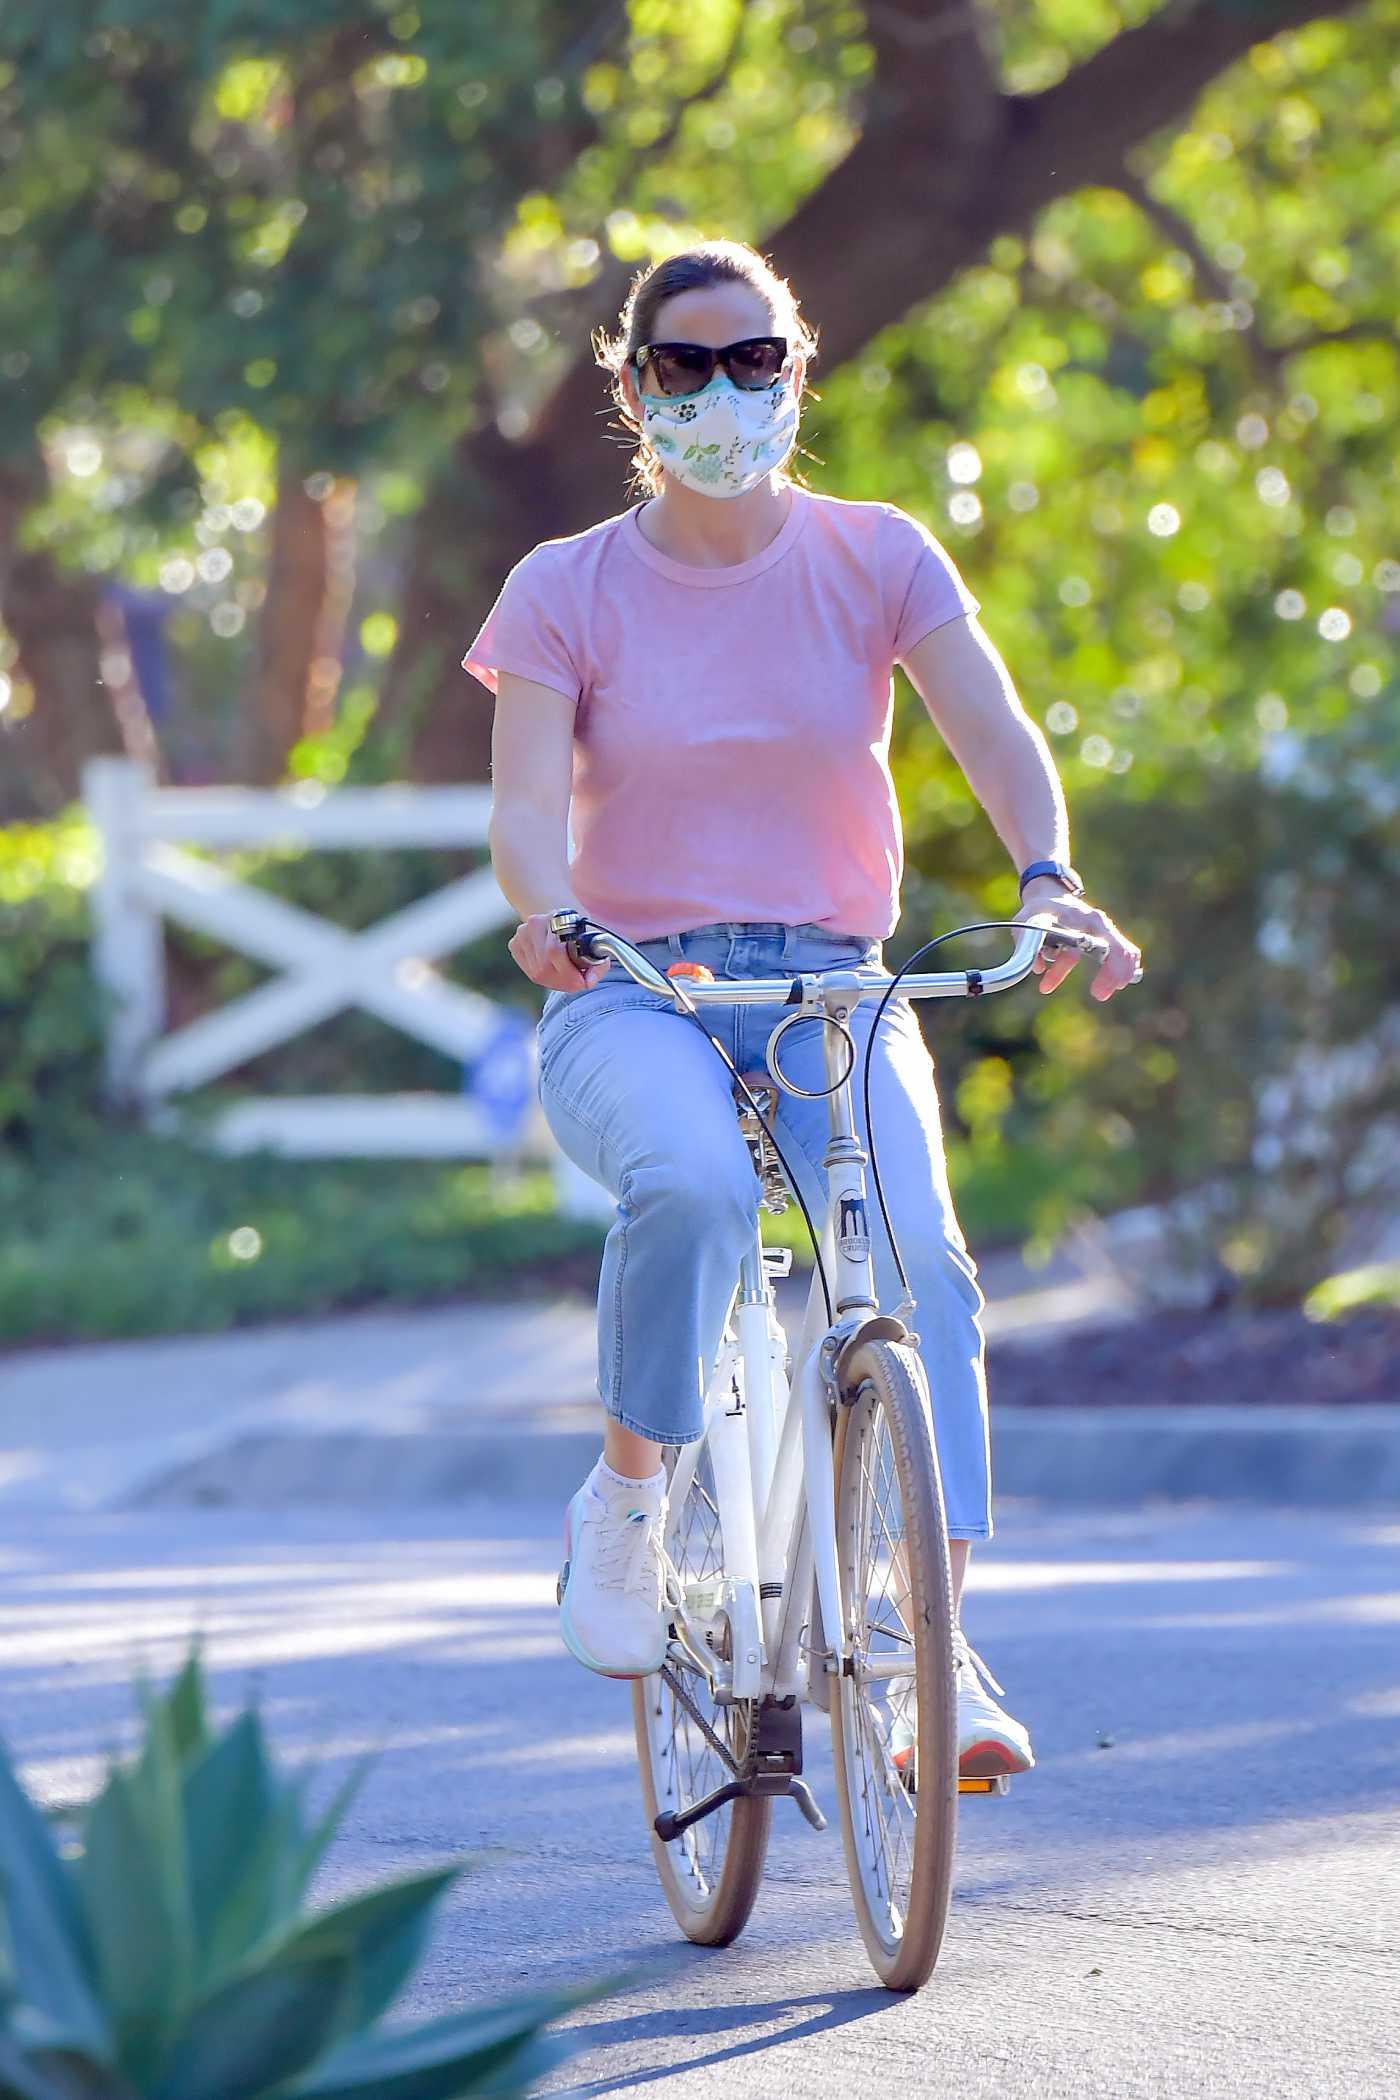 Jennifer Garner in a Purple Tee Rides Her Bike in Santa Monica 04/15/2020